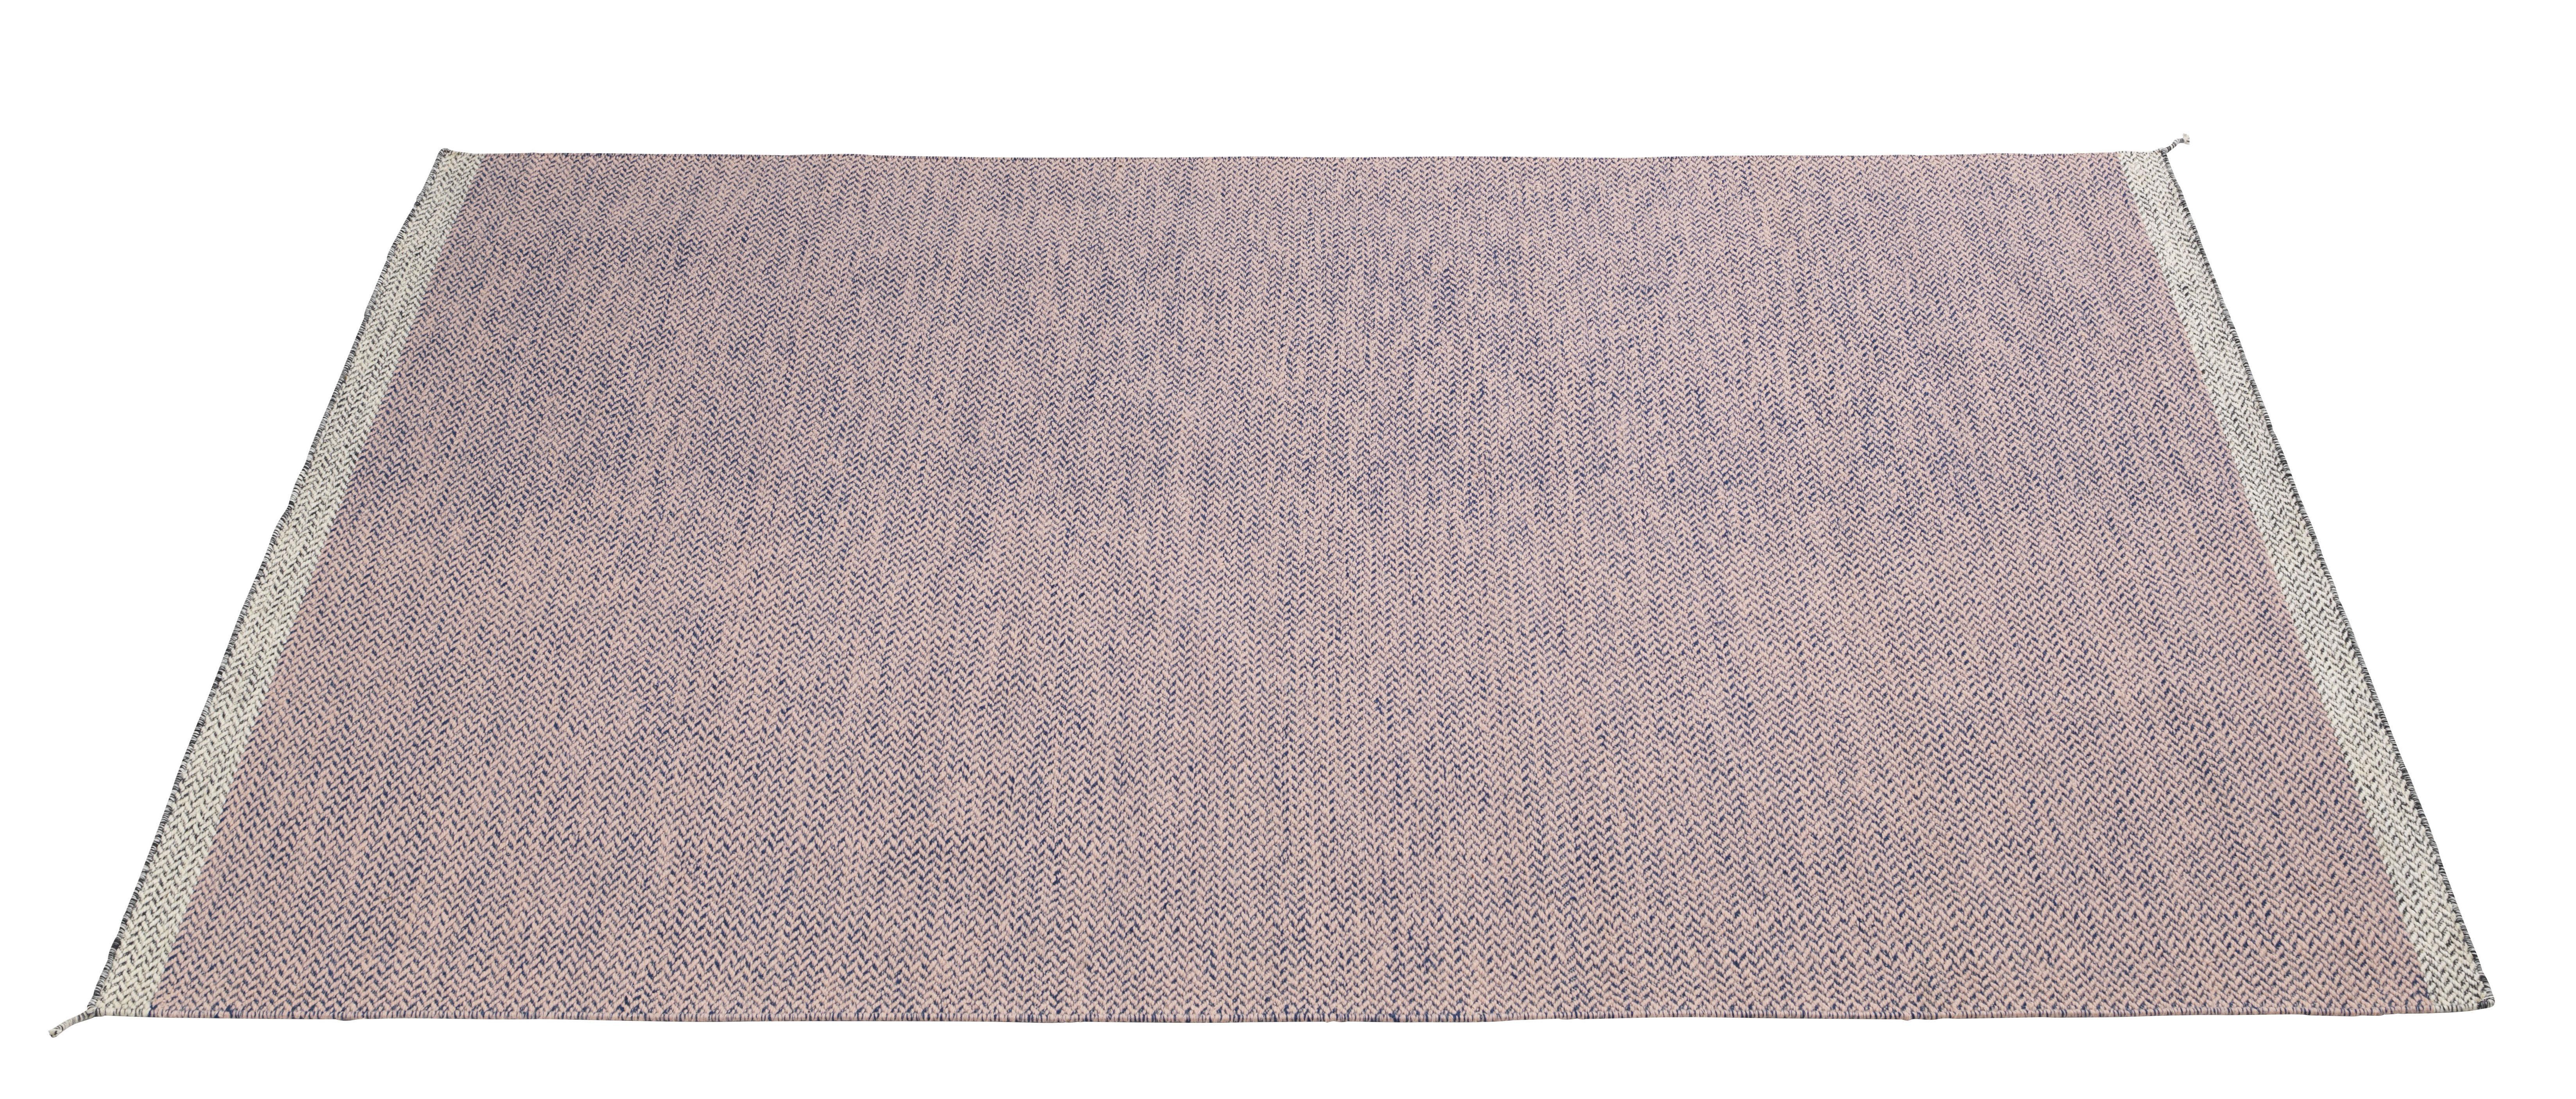 ply 200 x 300 cm handgewebt muuto teppich. Black Bedroom Furniture Sets. Home Design Ideas